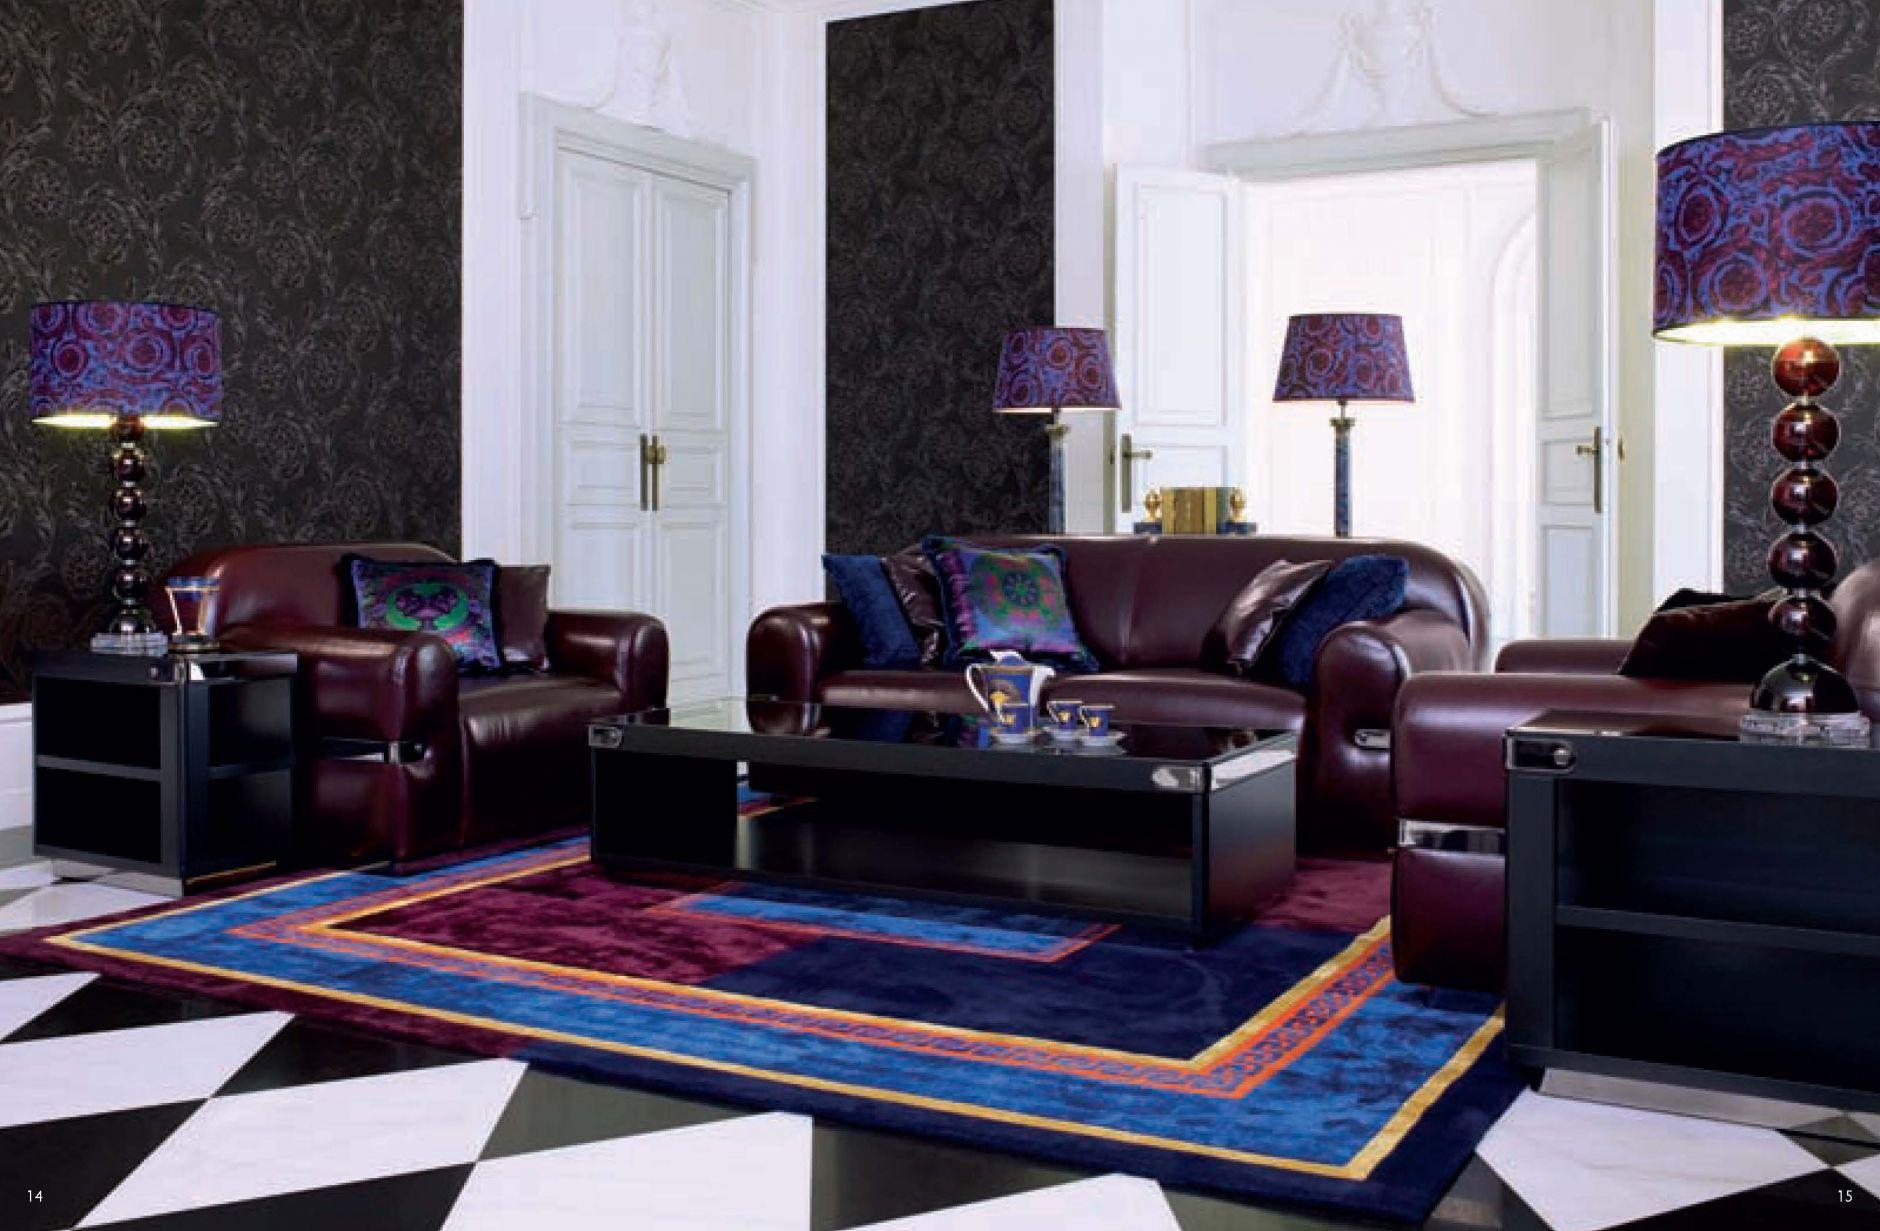 Versace Living Room Furniture Versace Design Living Room Sofa Set 5023 Ebay Versace Italian